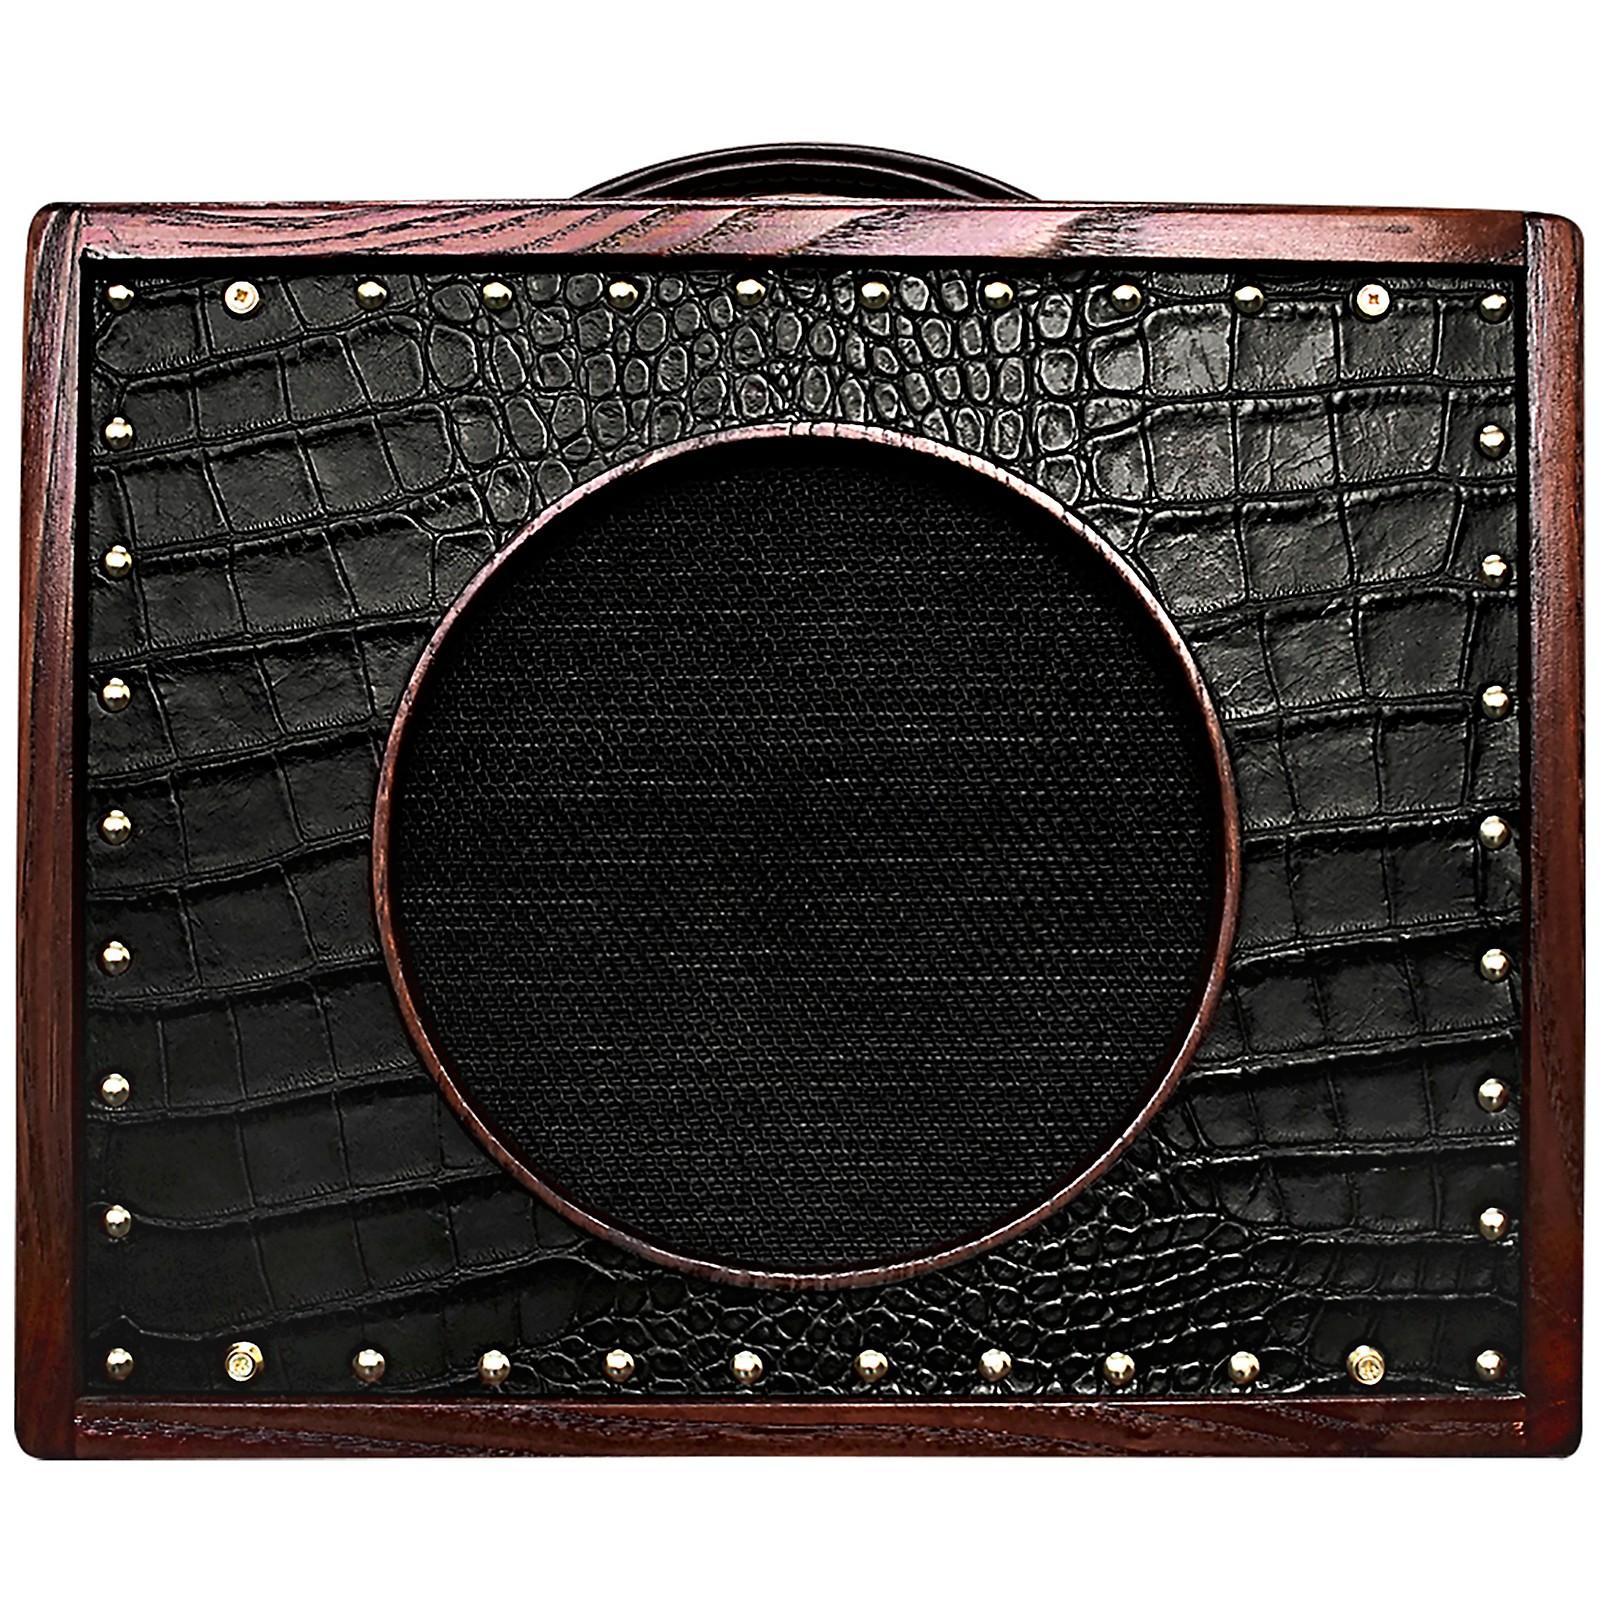 Paoletti Guitars Brutale 6W 1x10 Tube Guitar Combo Amp